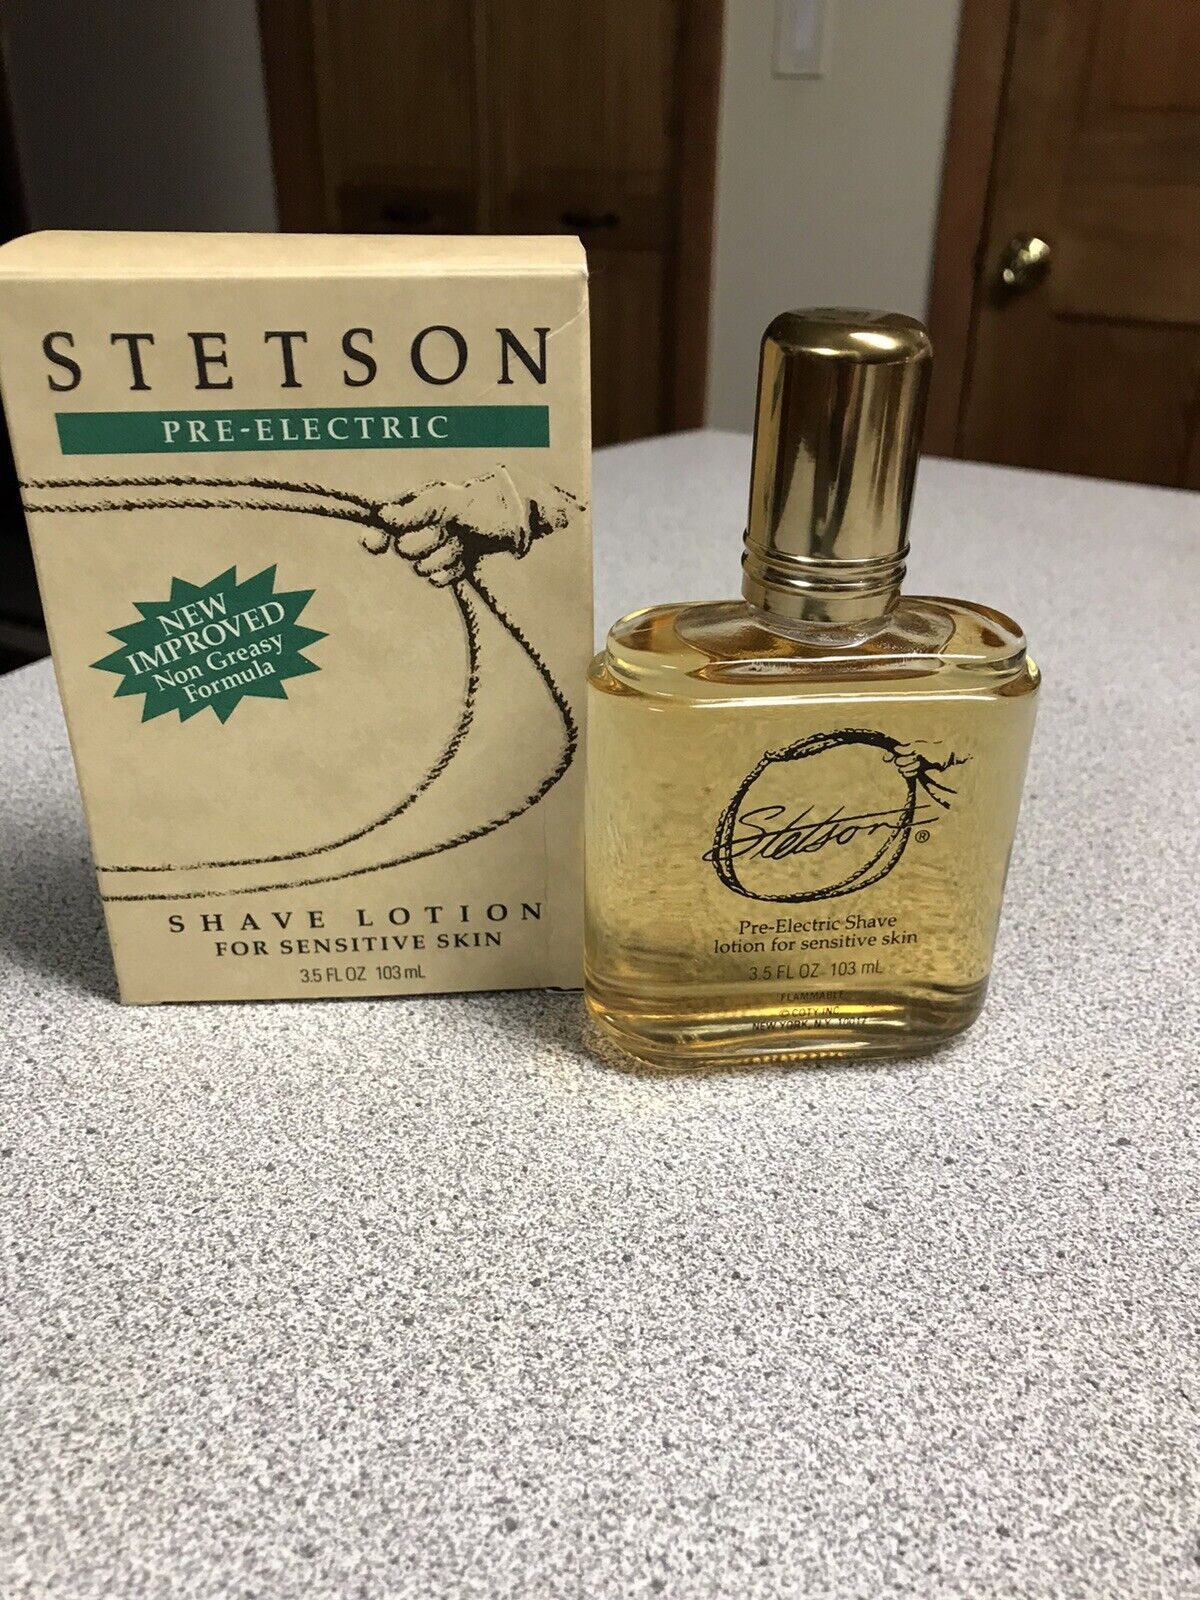 Vintage STETSON PRE - ELECTRIC Shave Lotion for Sensitive Sk